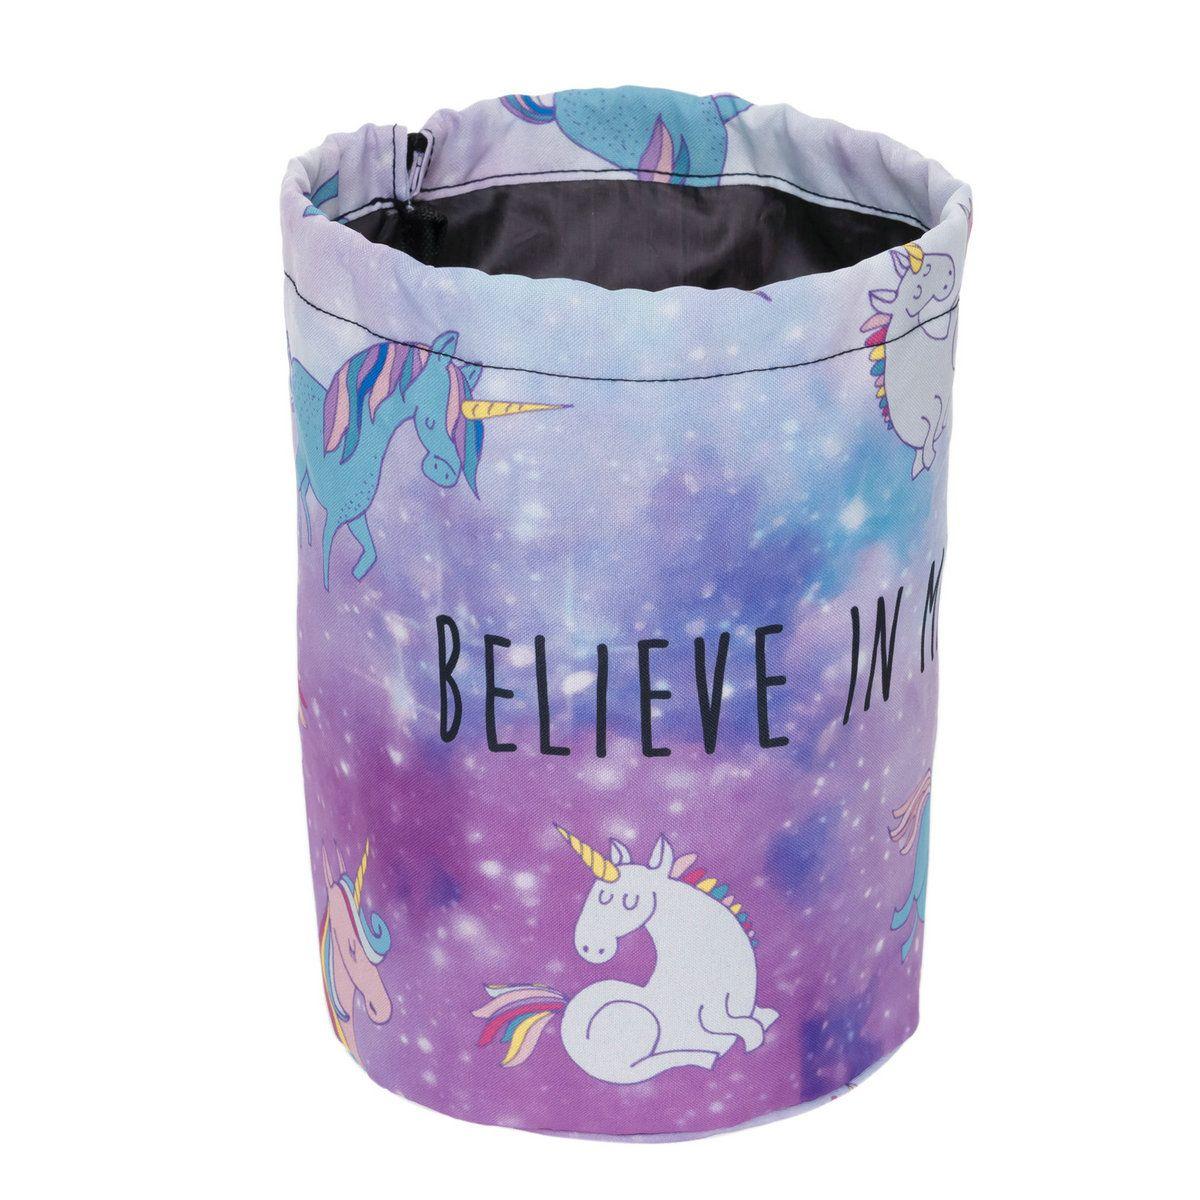 Barrel bucket Shaped Travel Cosmetic storage Bag Nylon Drum washable Makeup Organizer Drawstring Wash Bag Travel Makeup Storage